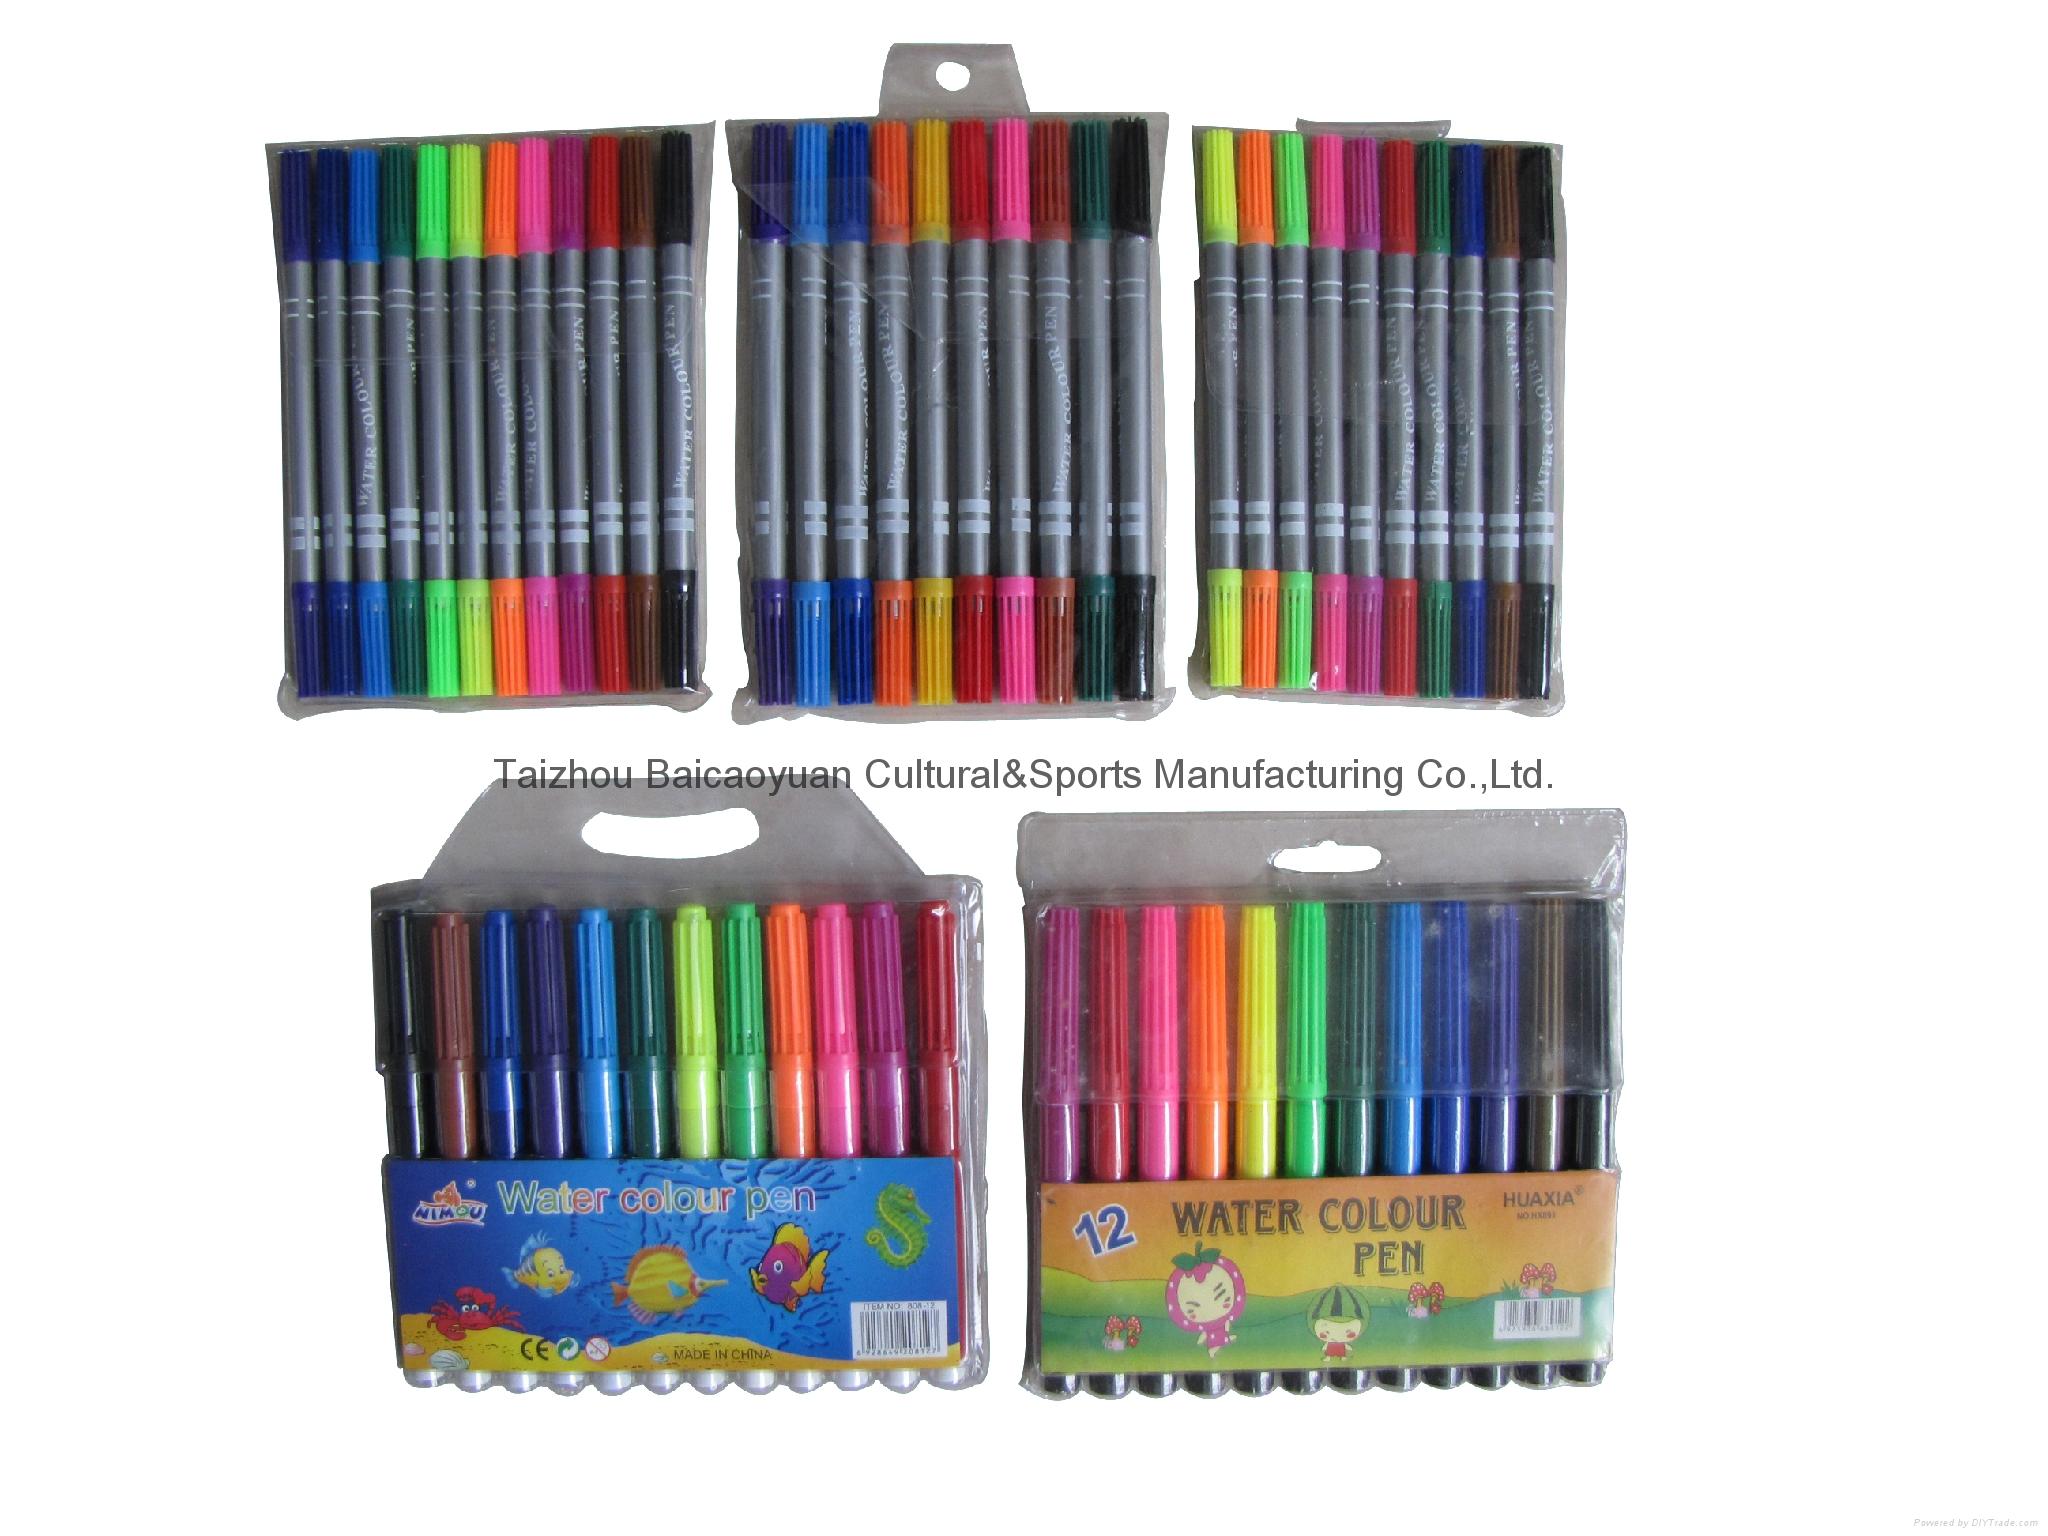 water color pen 2